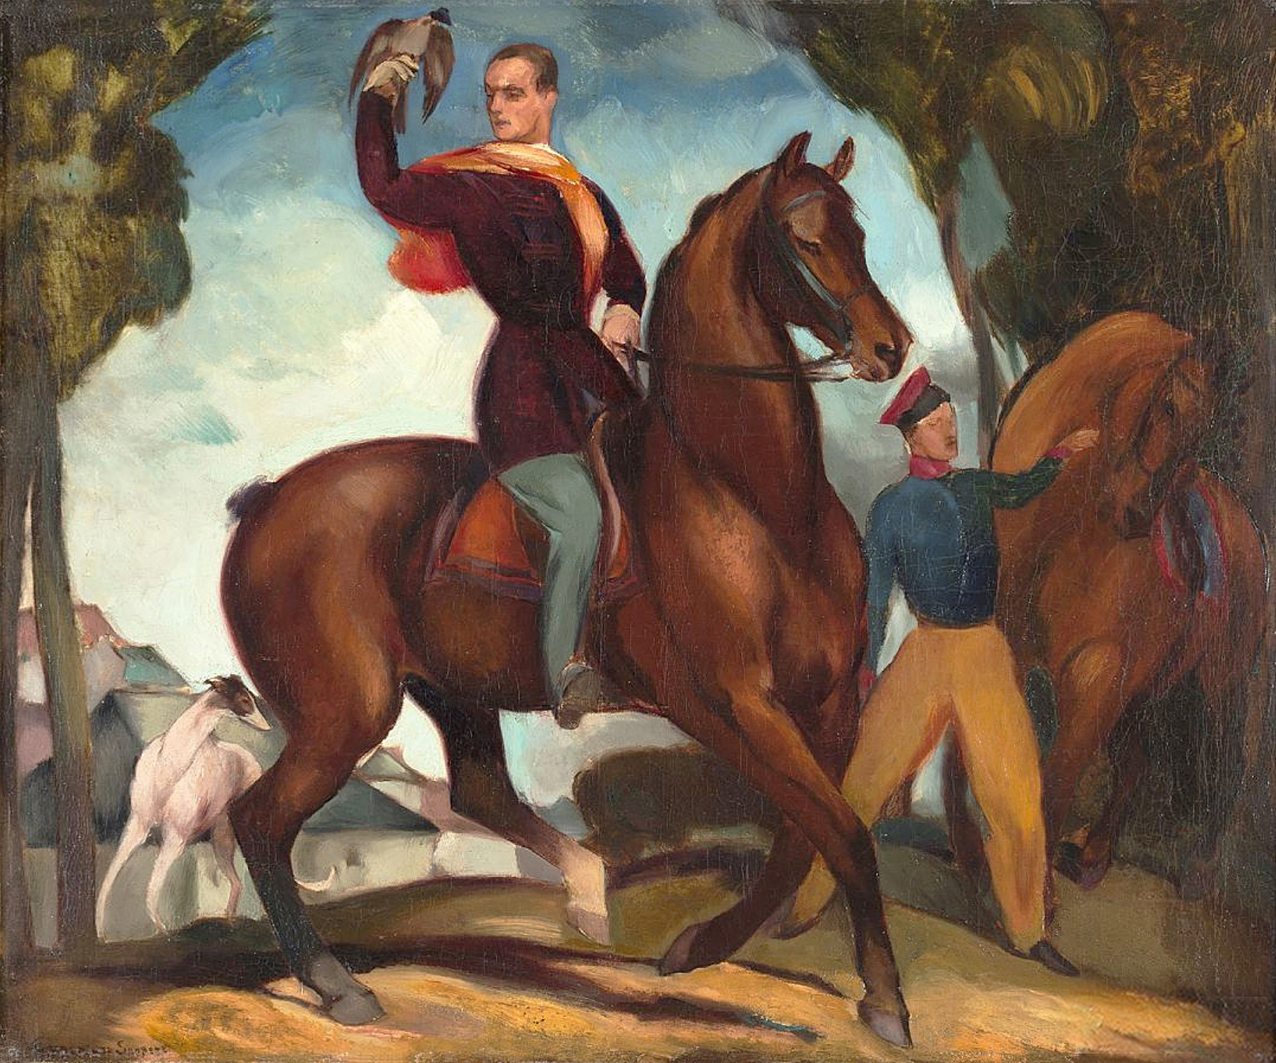 Євген Гепперт. Вершник, 1924; полотно, олія